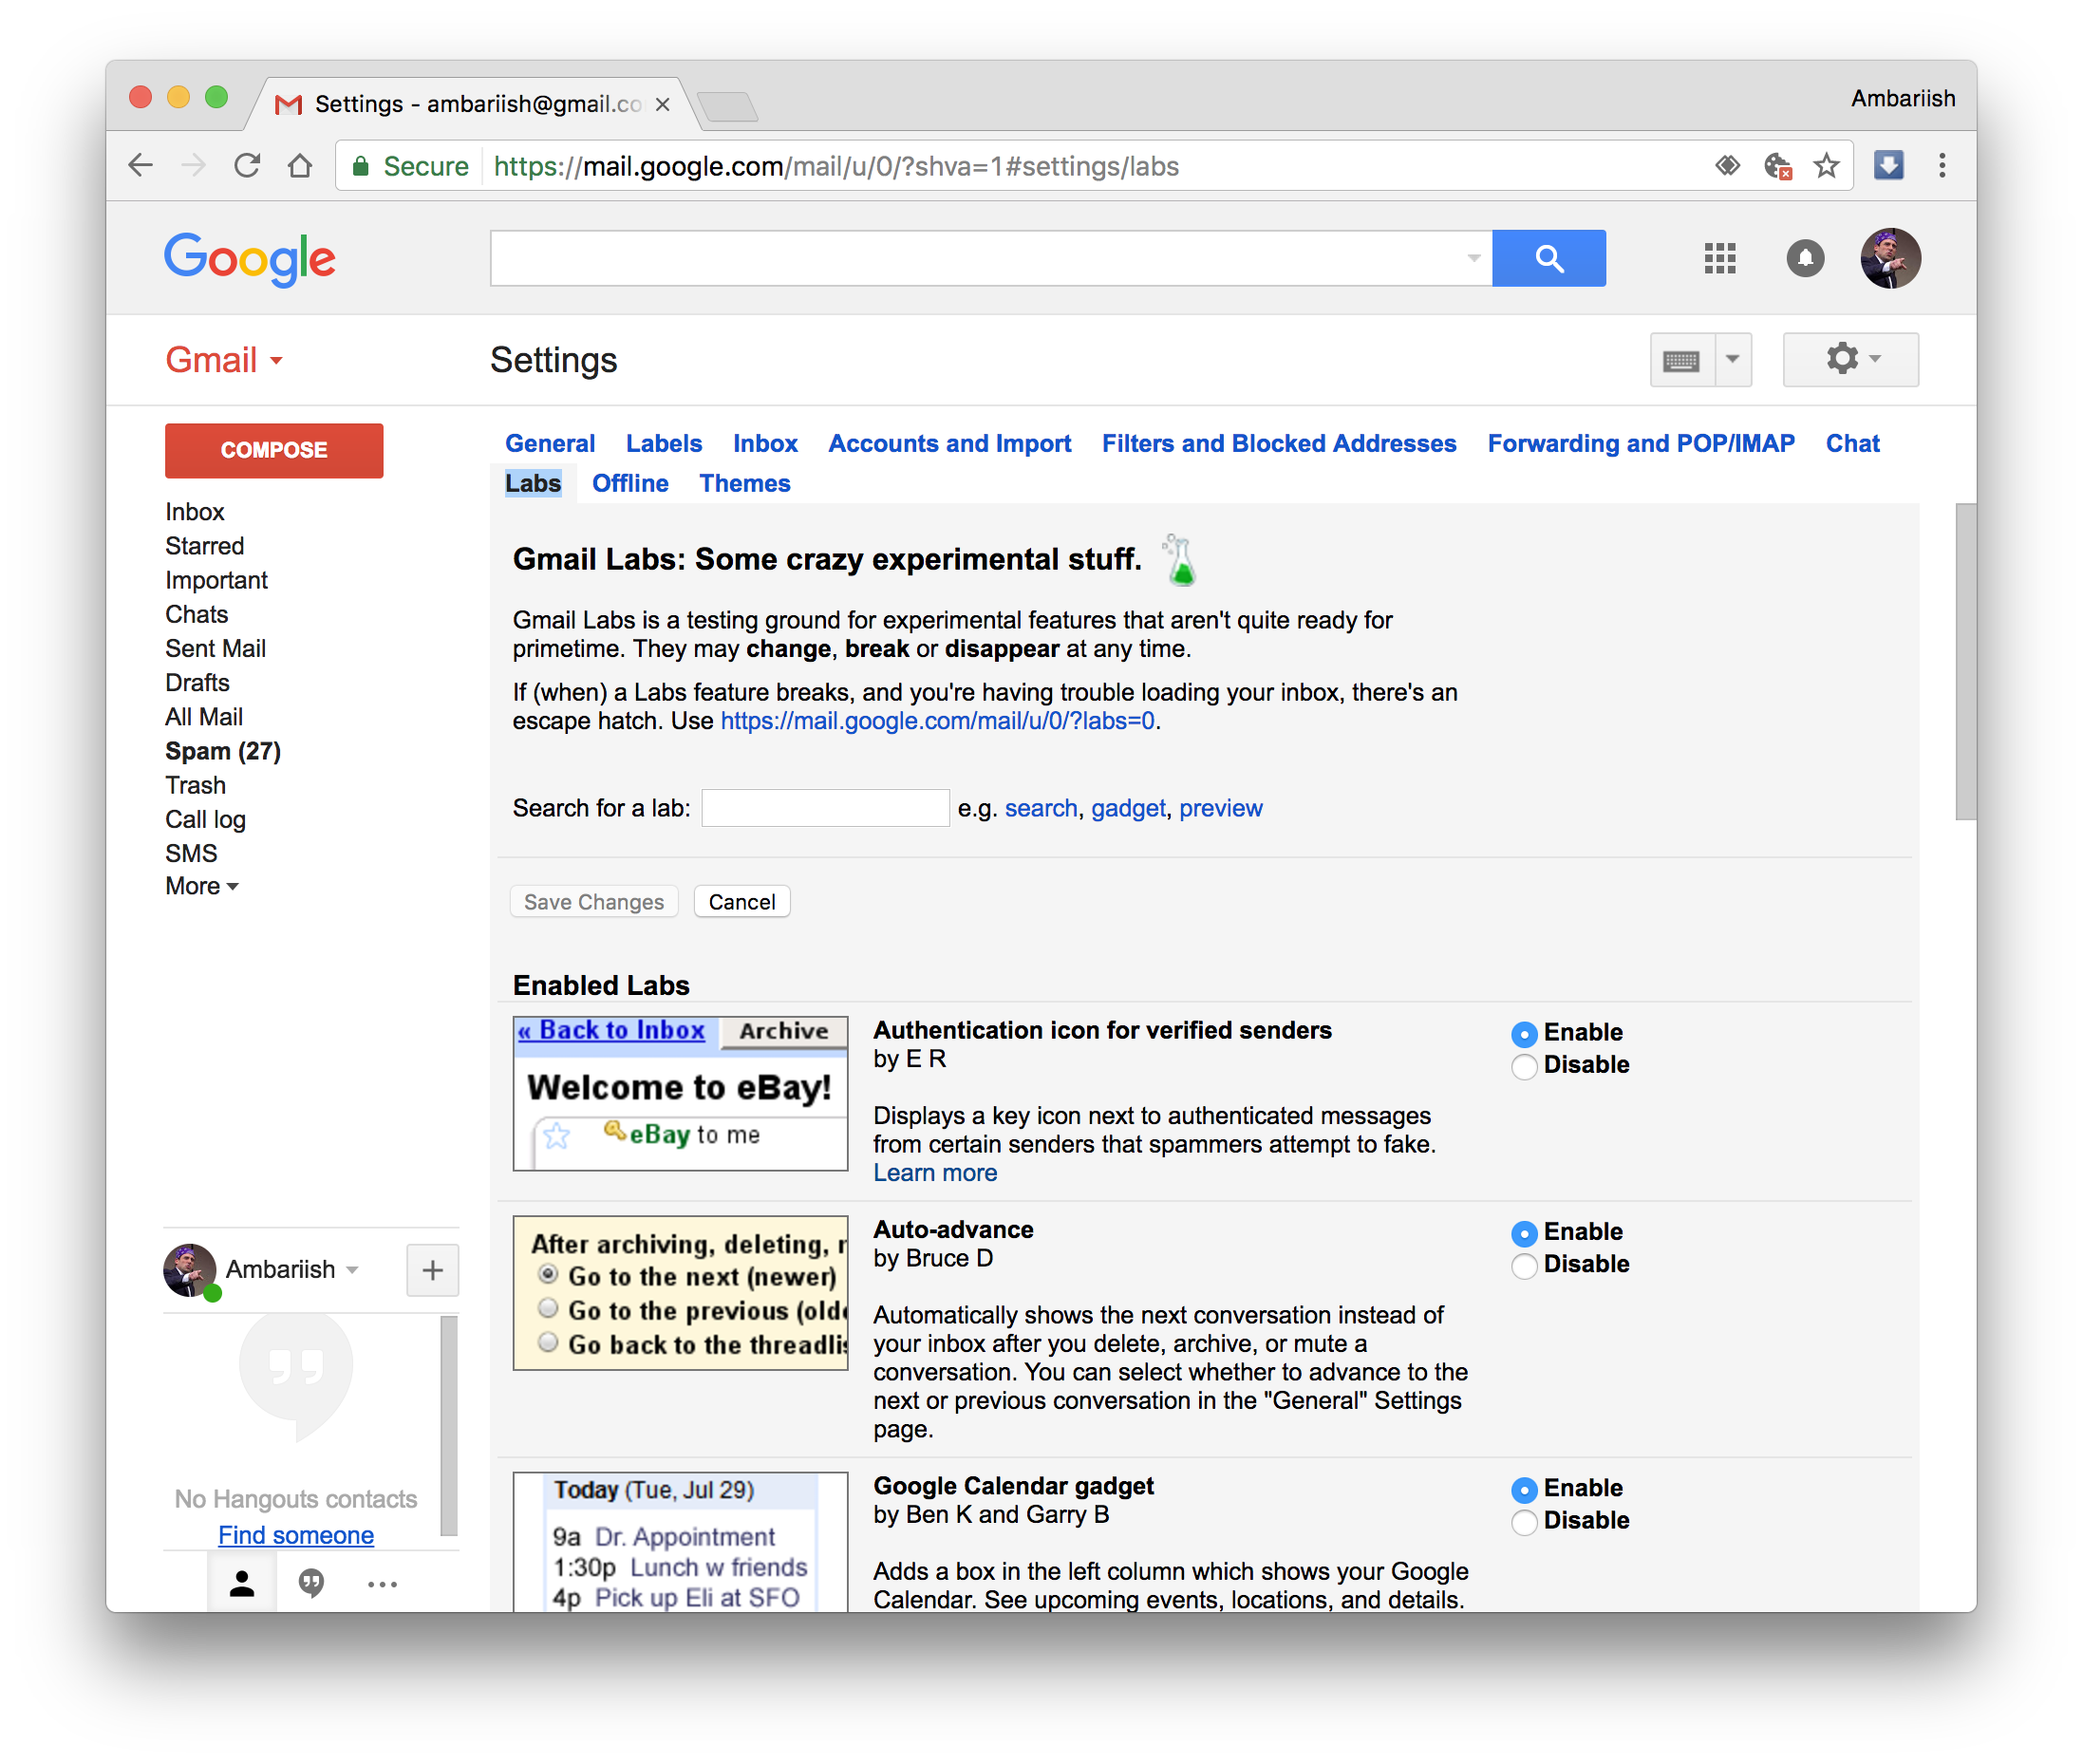 Visit Gmail Labs